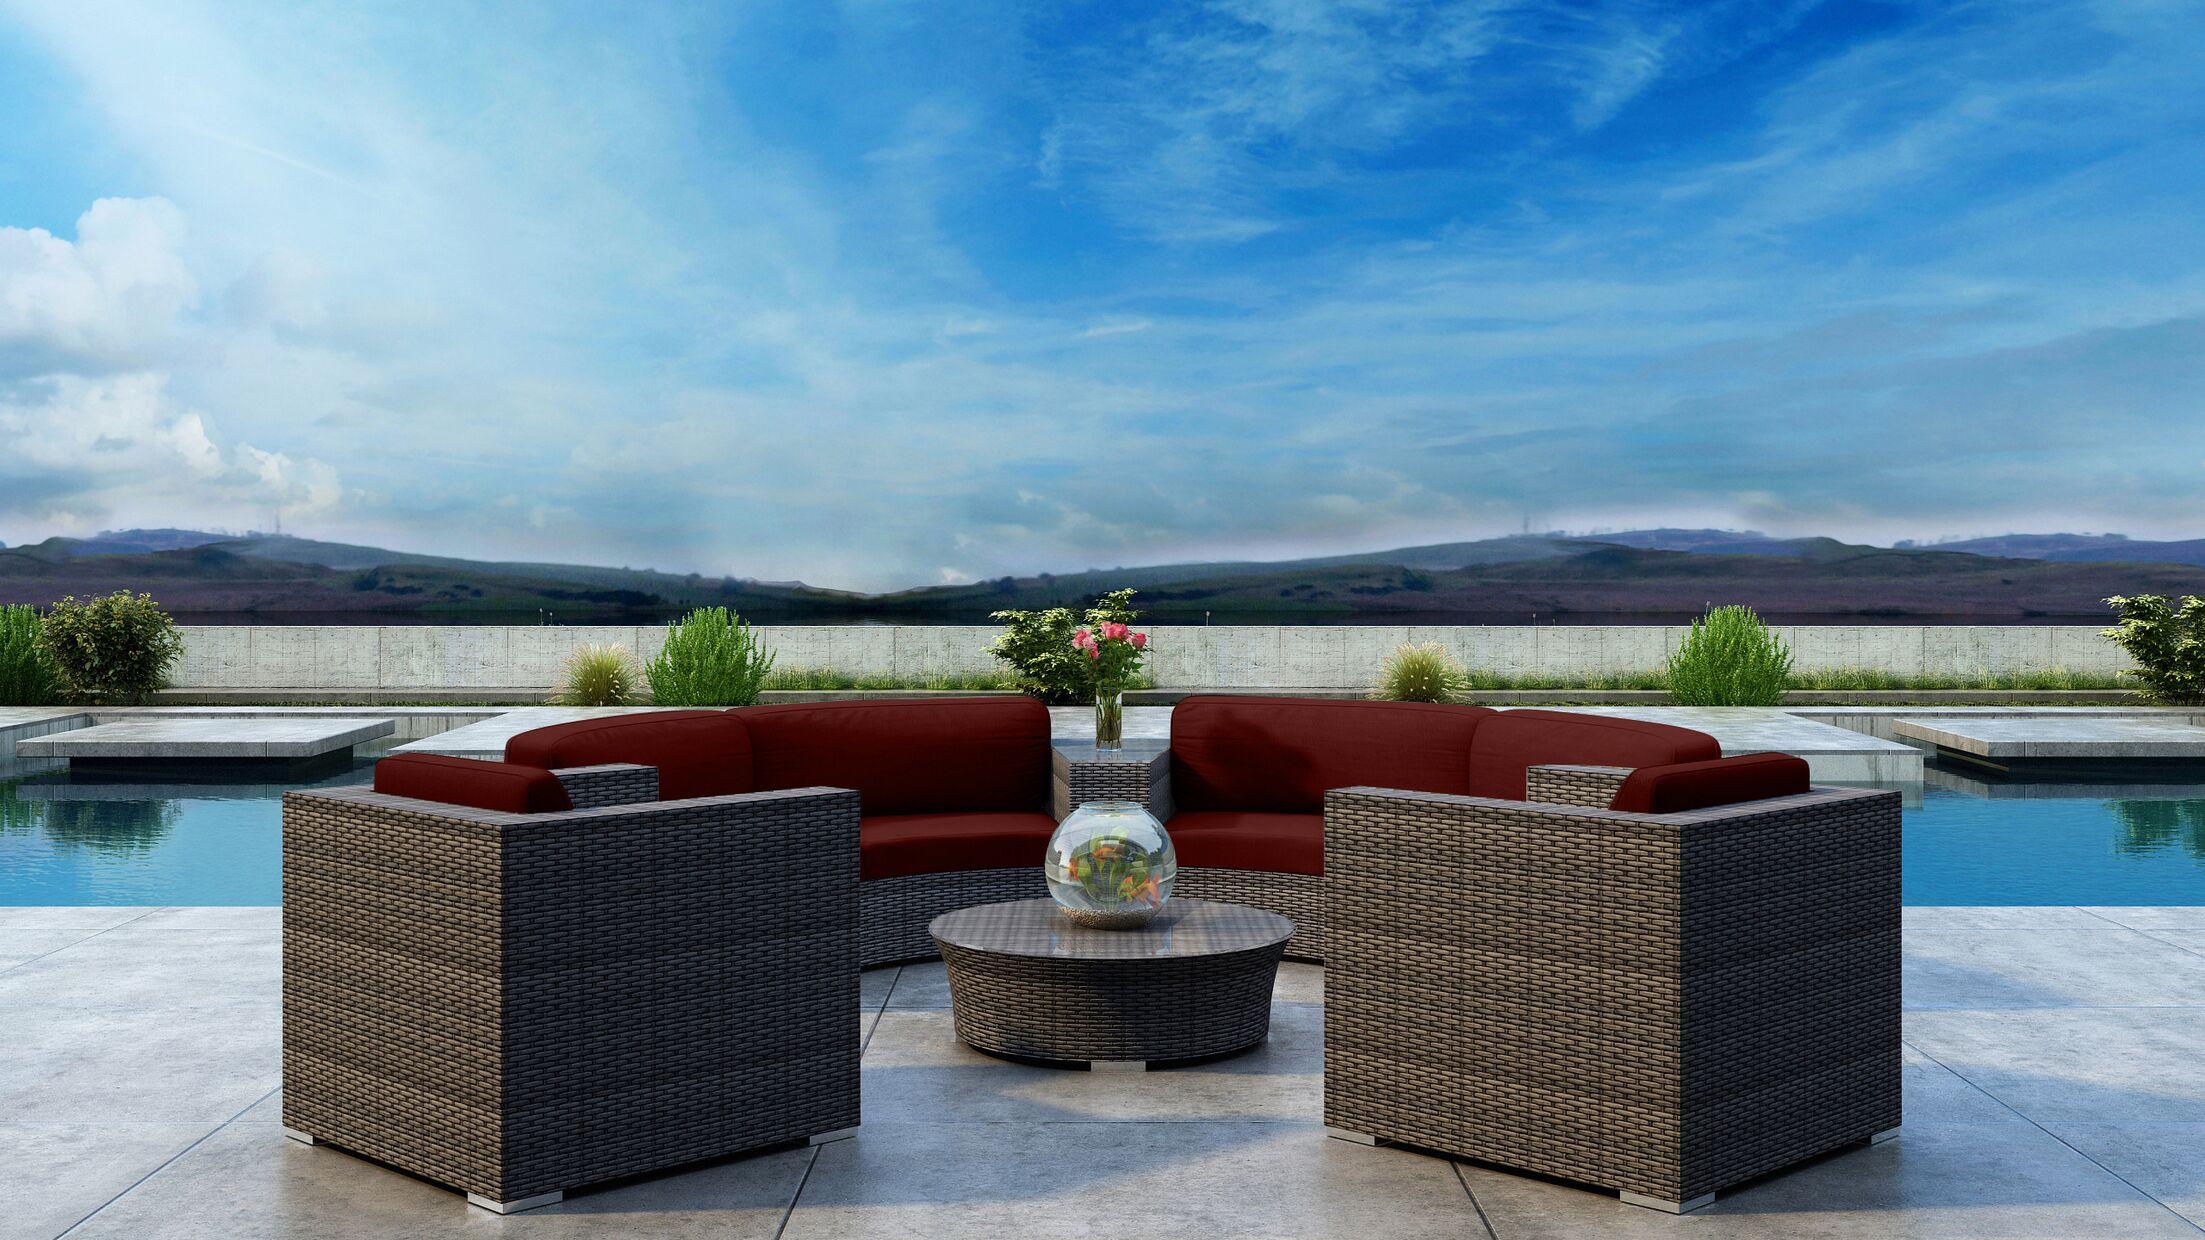 Gilleland 6 Piece Sectional Set with Sunbrella Cushion Cushion Color: Canvas Henna